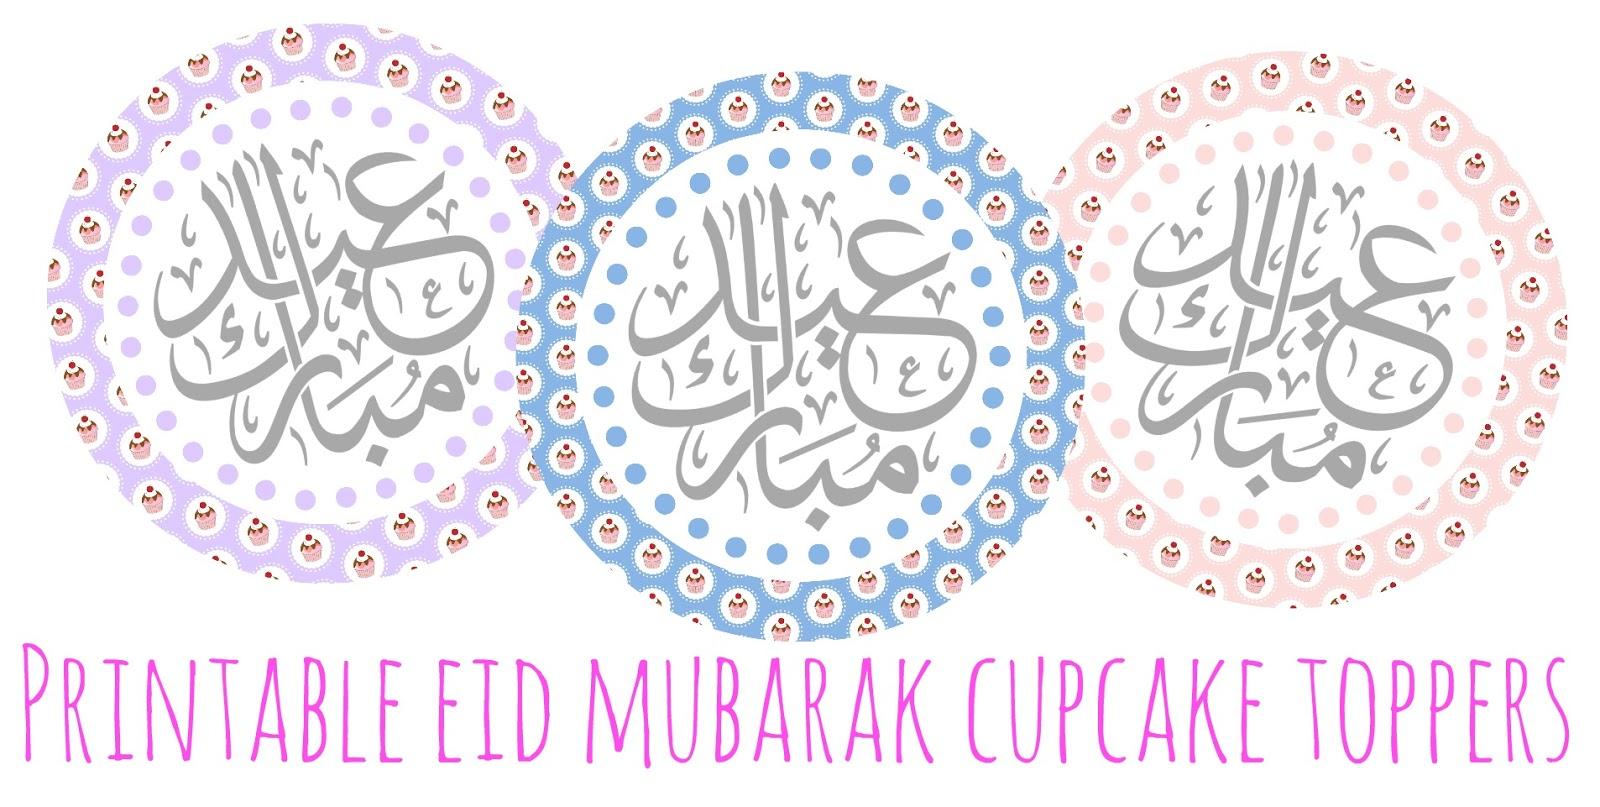 Top Free Printable Eid Al-Fitr Decorations - printable%2Beid%2Bmubarak%2Bcupcake%2Btoppers%2Bfree  Collection_652972 .jpg